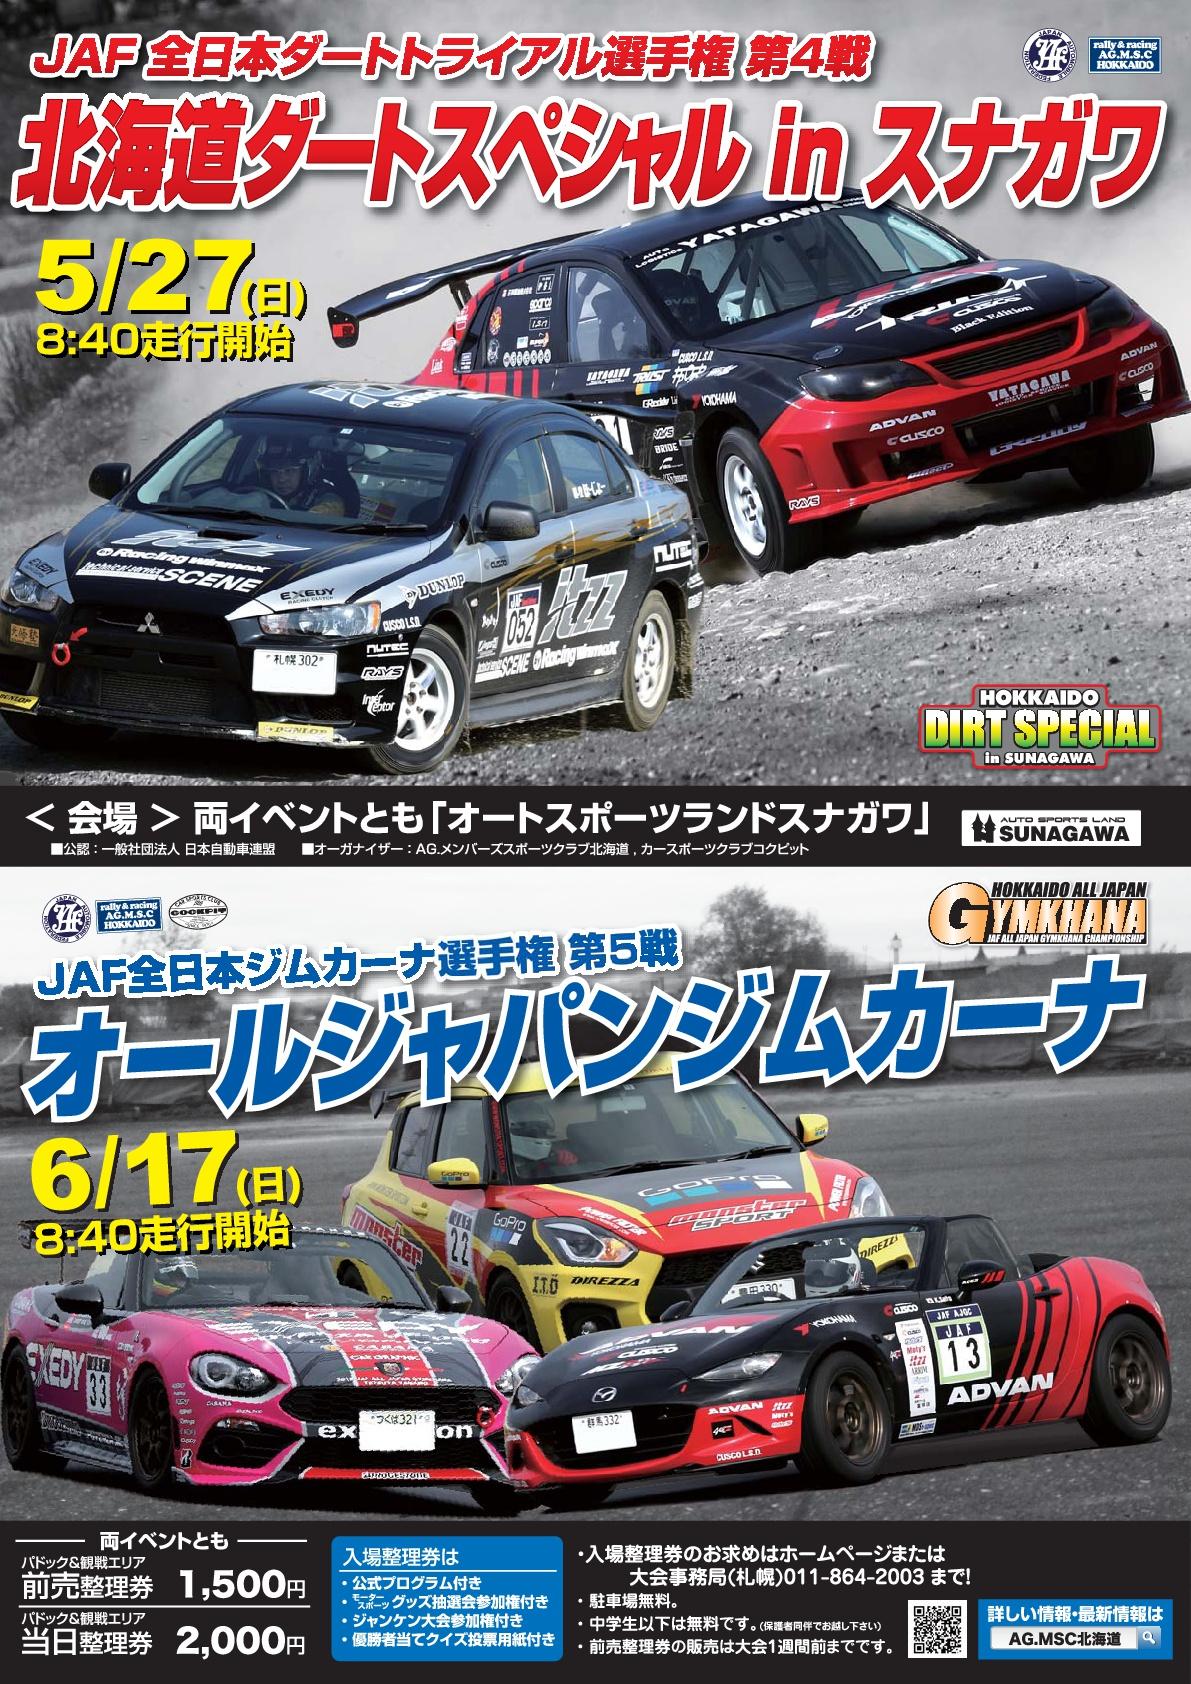 JAF全日本ダートトライアル選手権 第4戦北海道ダートスペシャル in スナガワ(2018年)のポスター